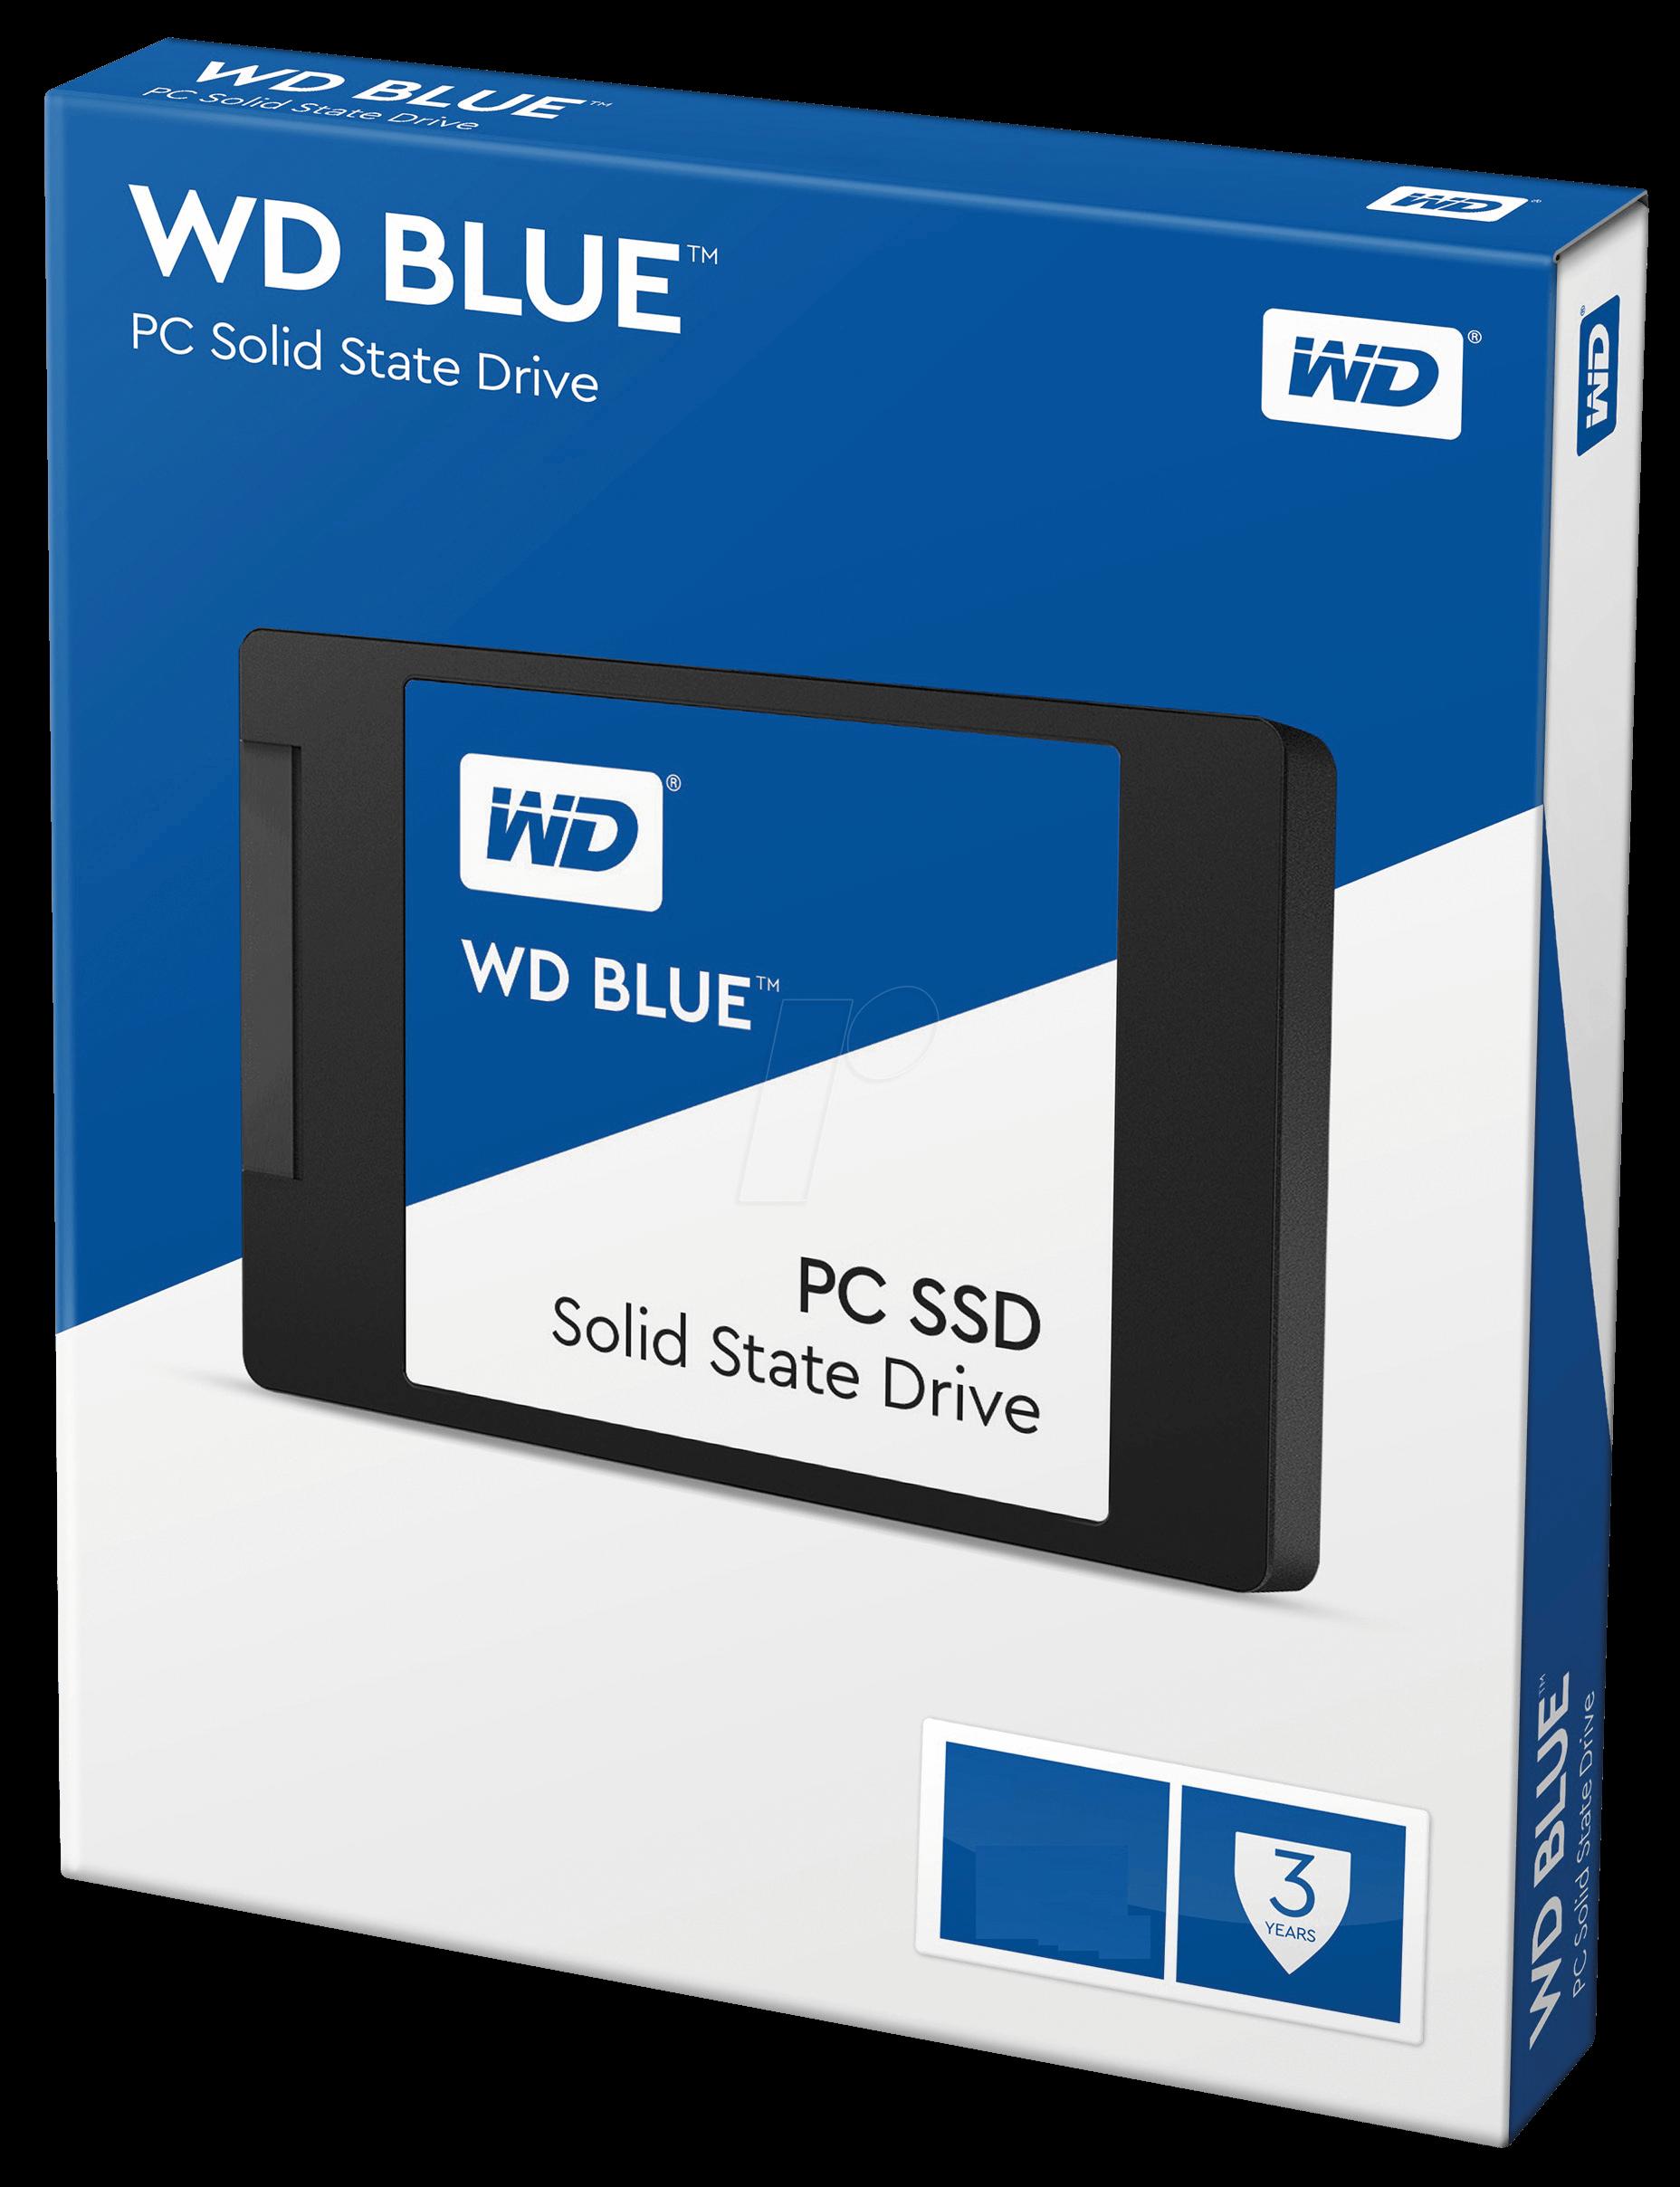 ZyXEL 2x NAS326 Marvell DC 1.3ghz 512mb Glan USB 3.0 Nas Server (Disksiz) (2x6TB:12TB Kapasiteye Kadar Destekler)